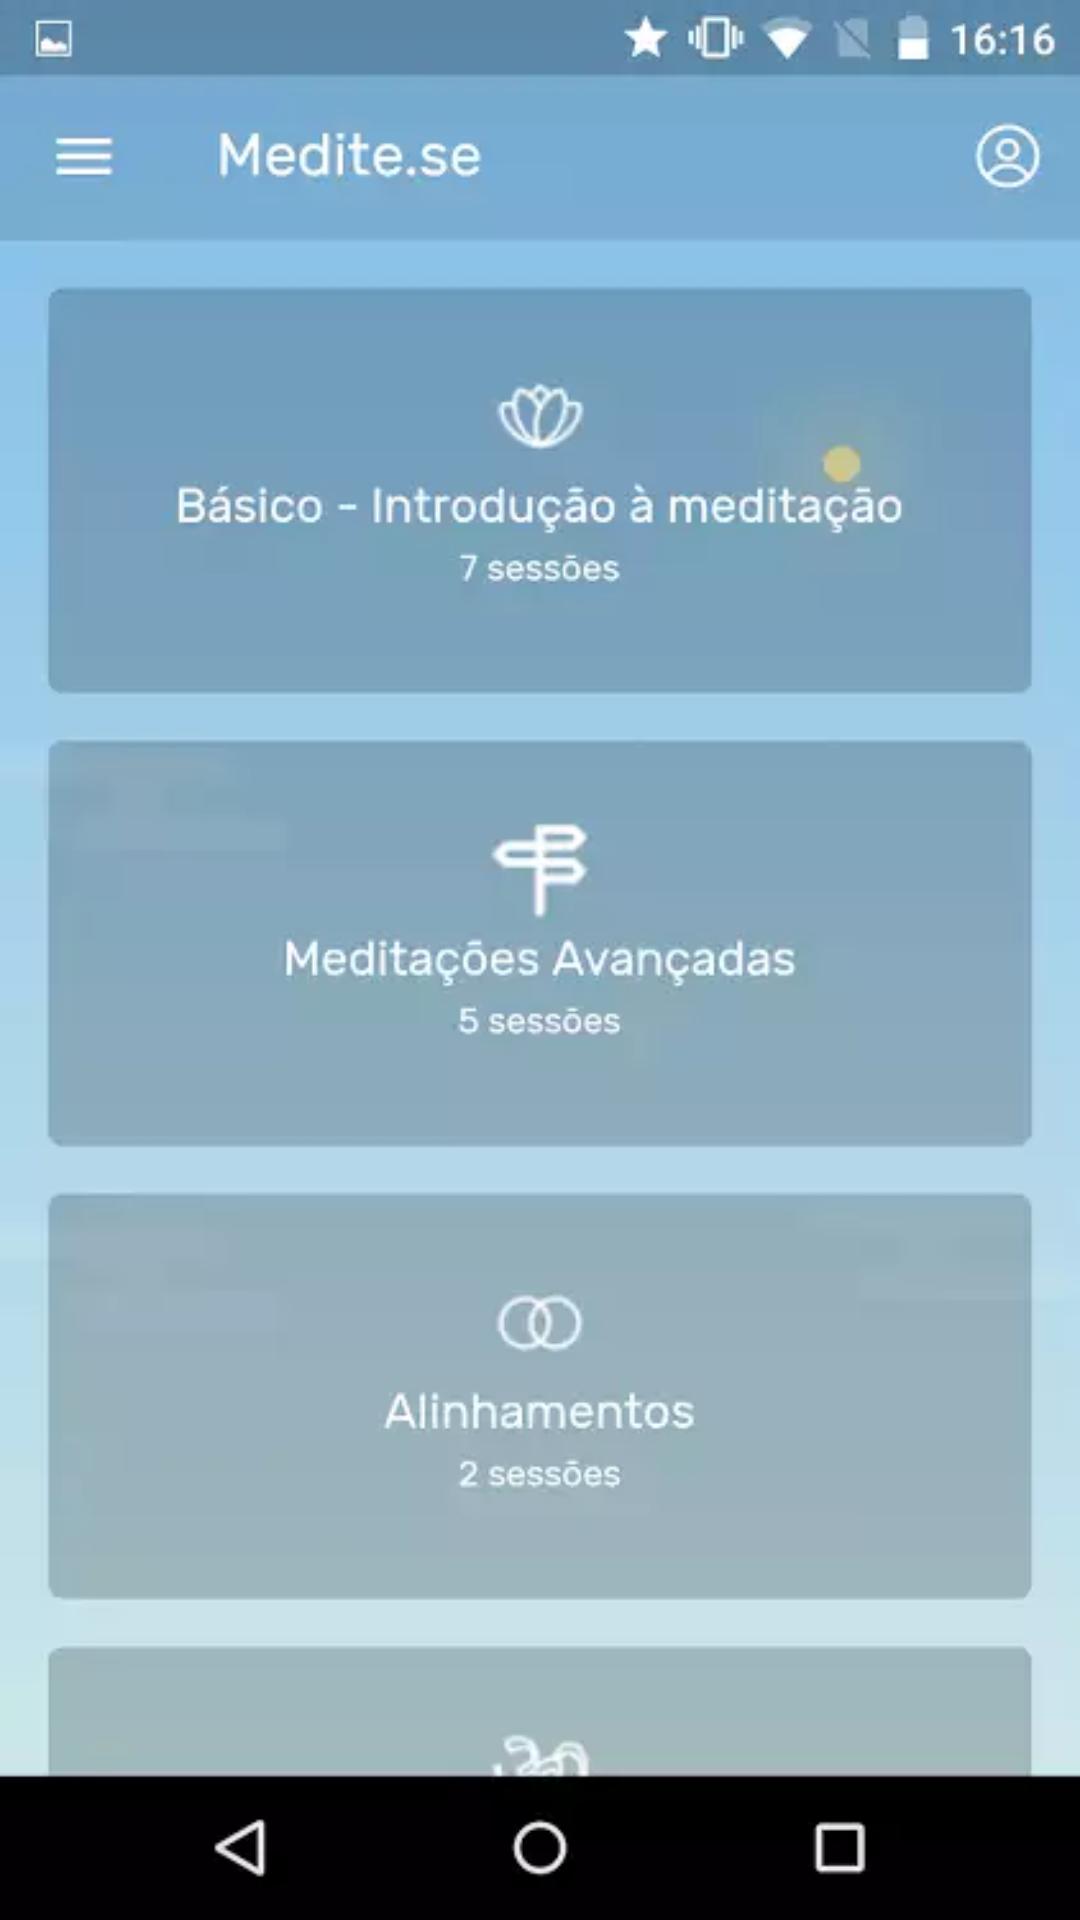 Medite.se